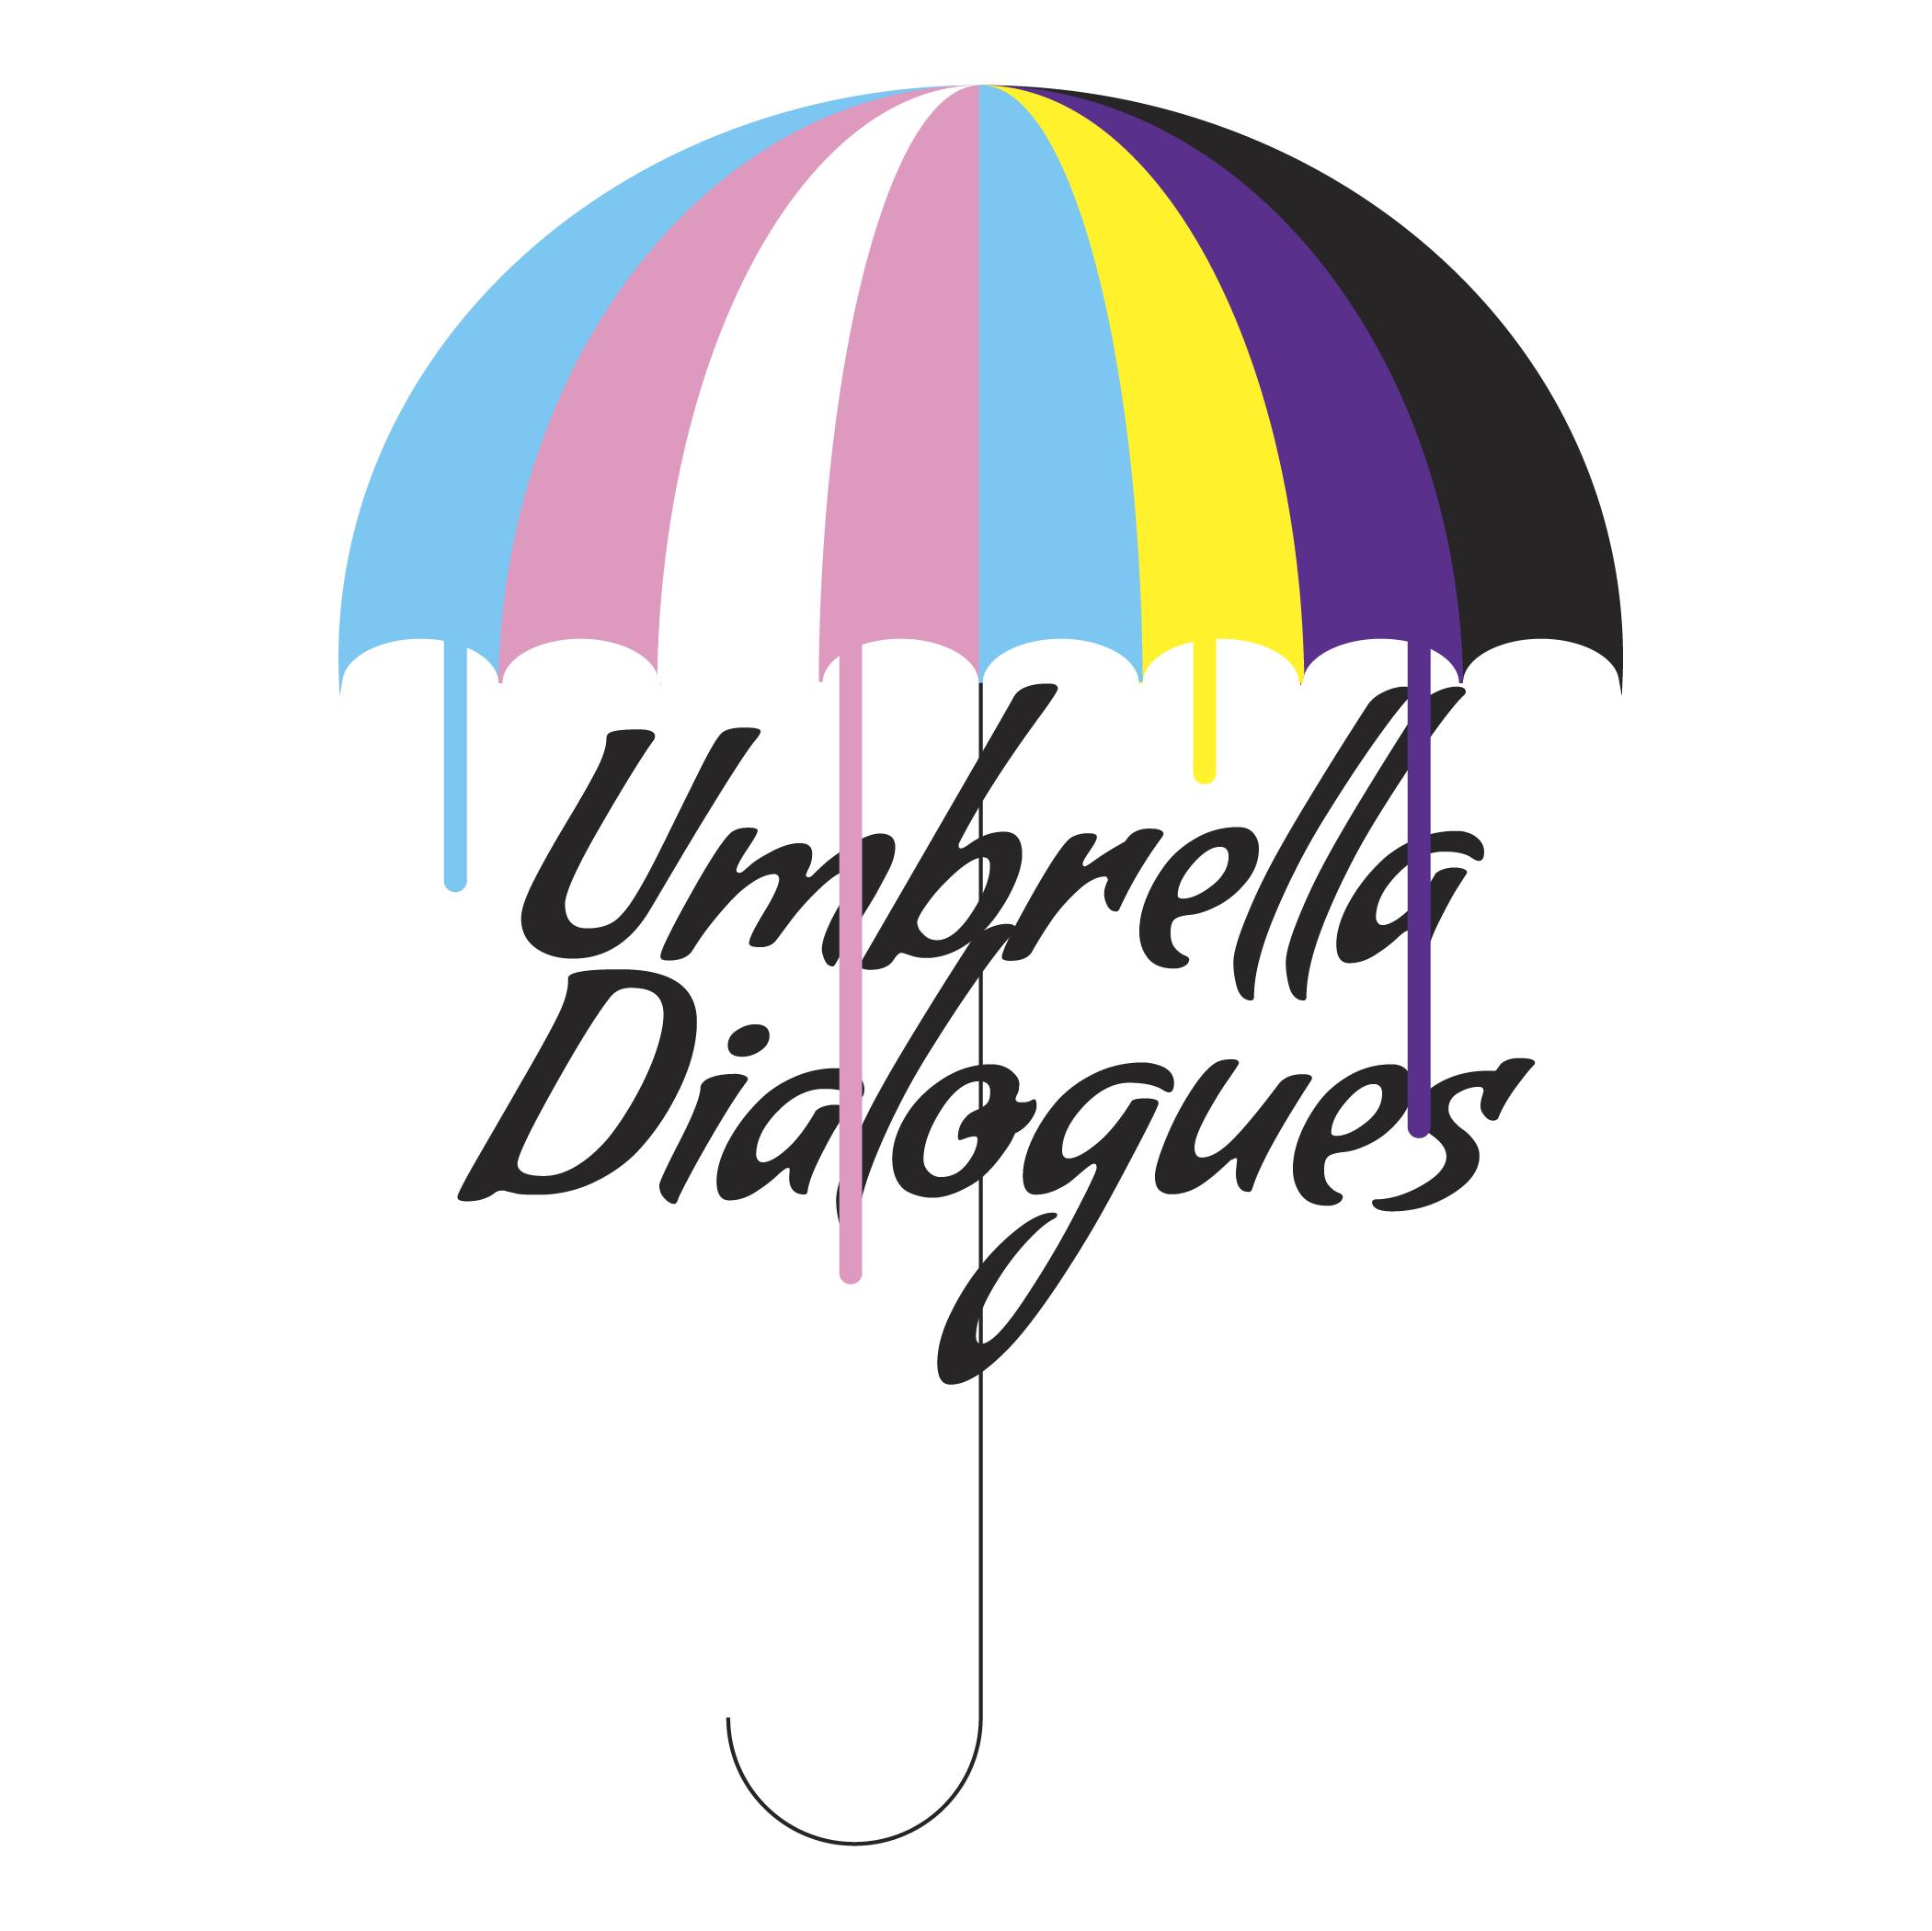 Umbrella Affinity Group